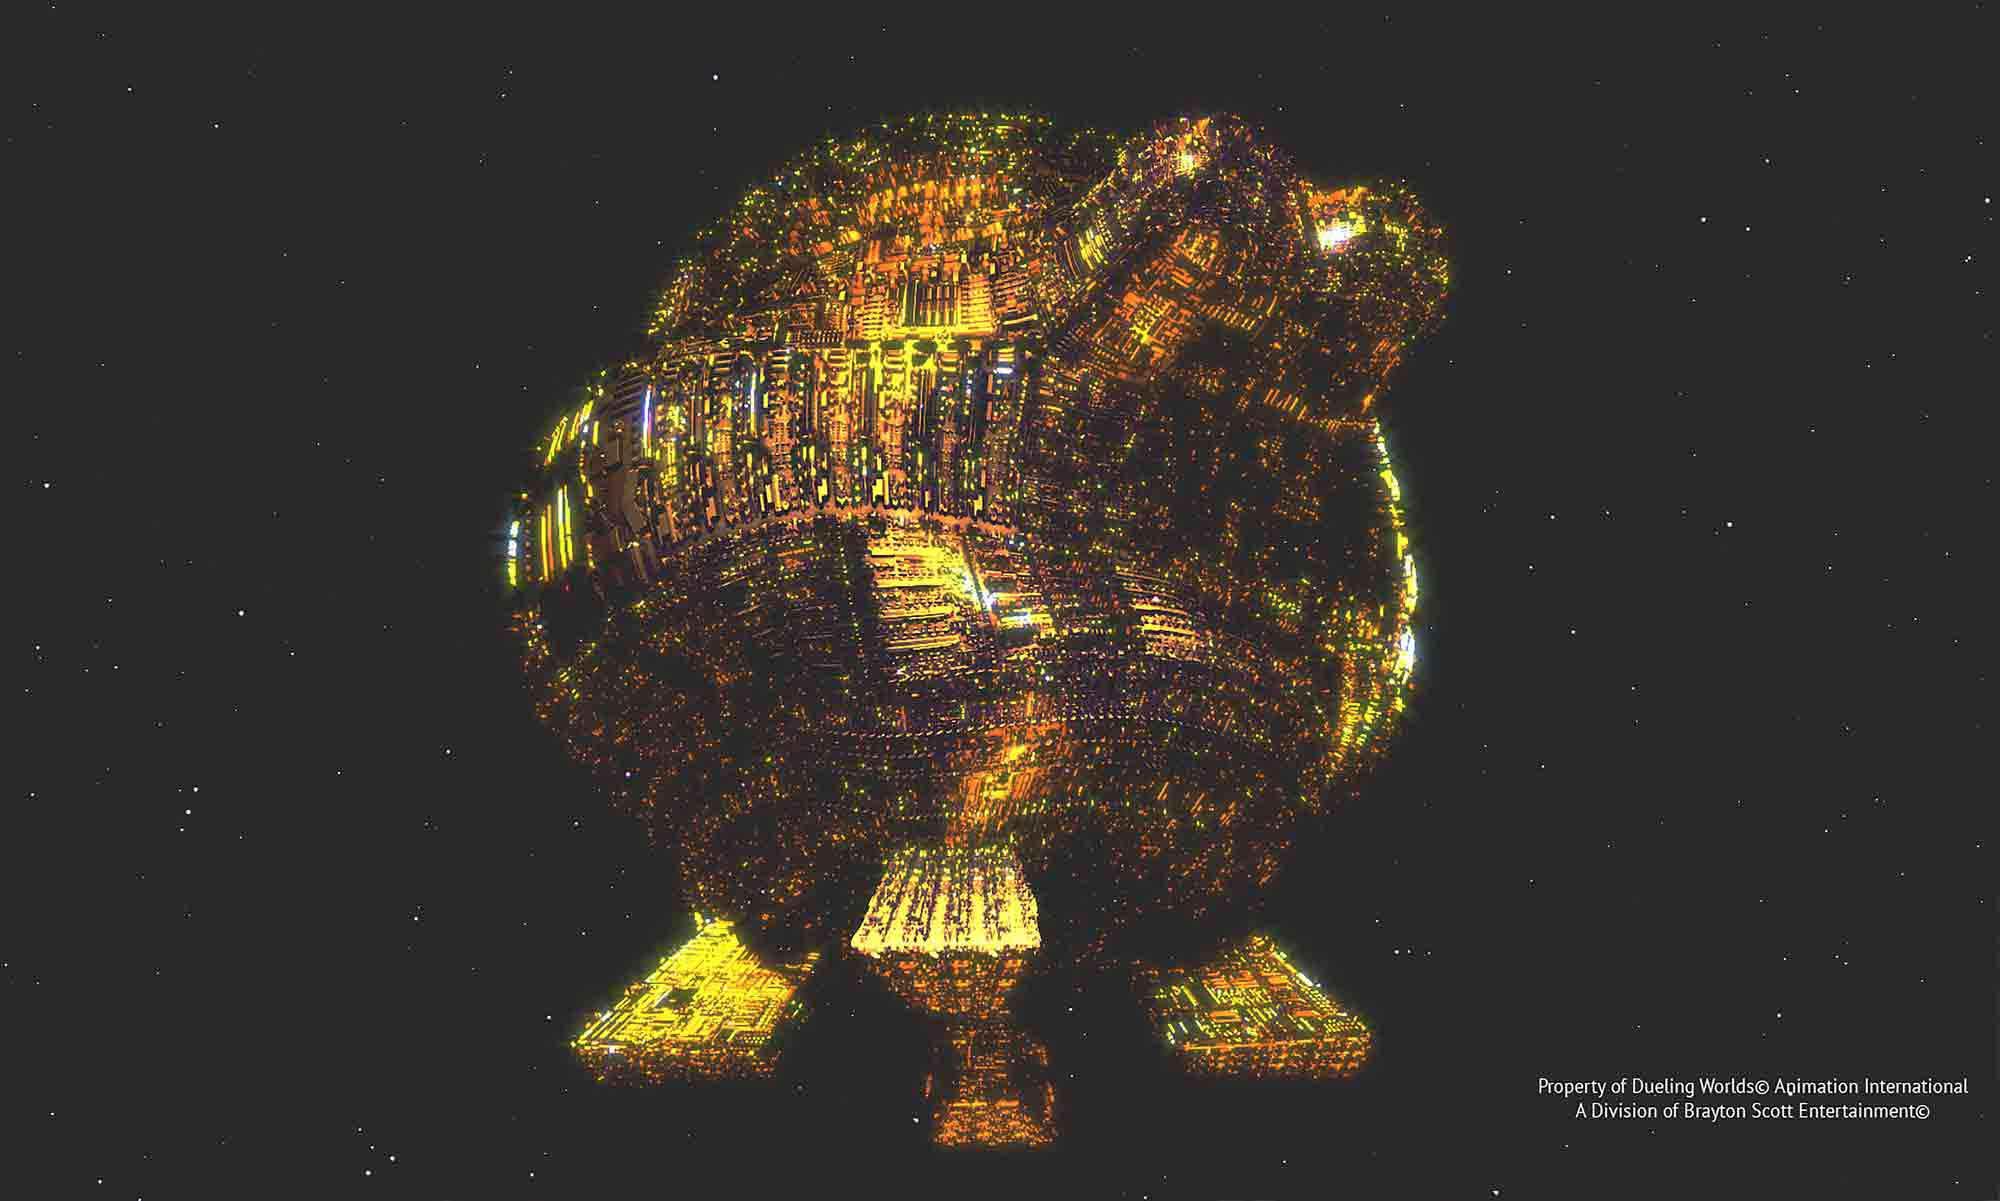 Image of Dueling-Worlds-International-Braytonion-Deep-Galaxy-Space-World-Insta